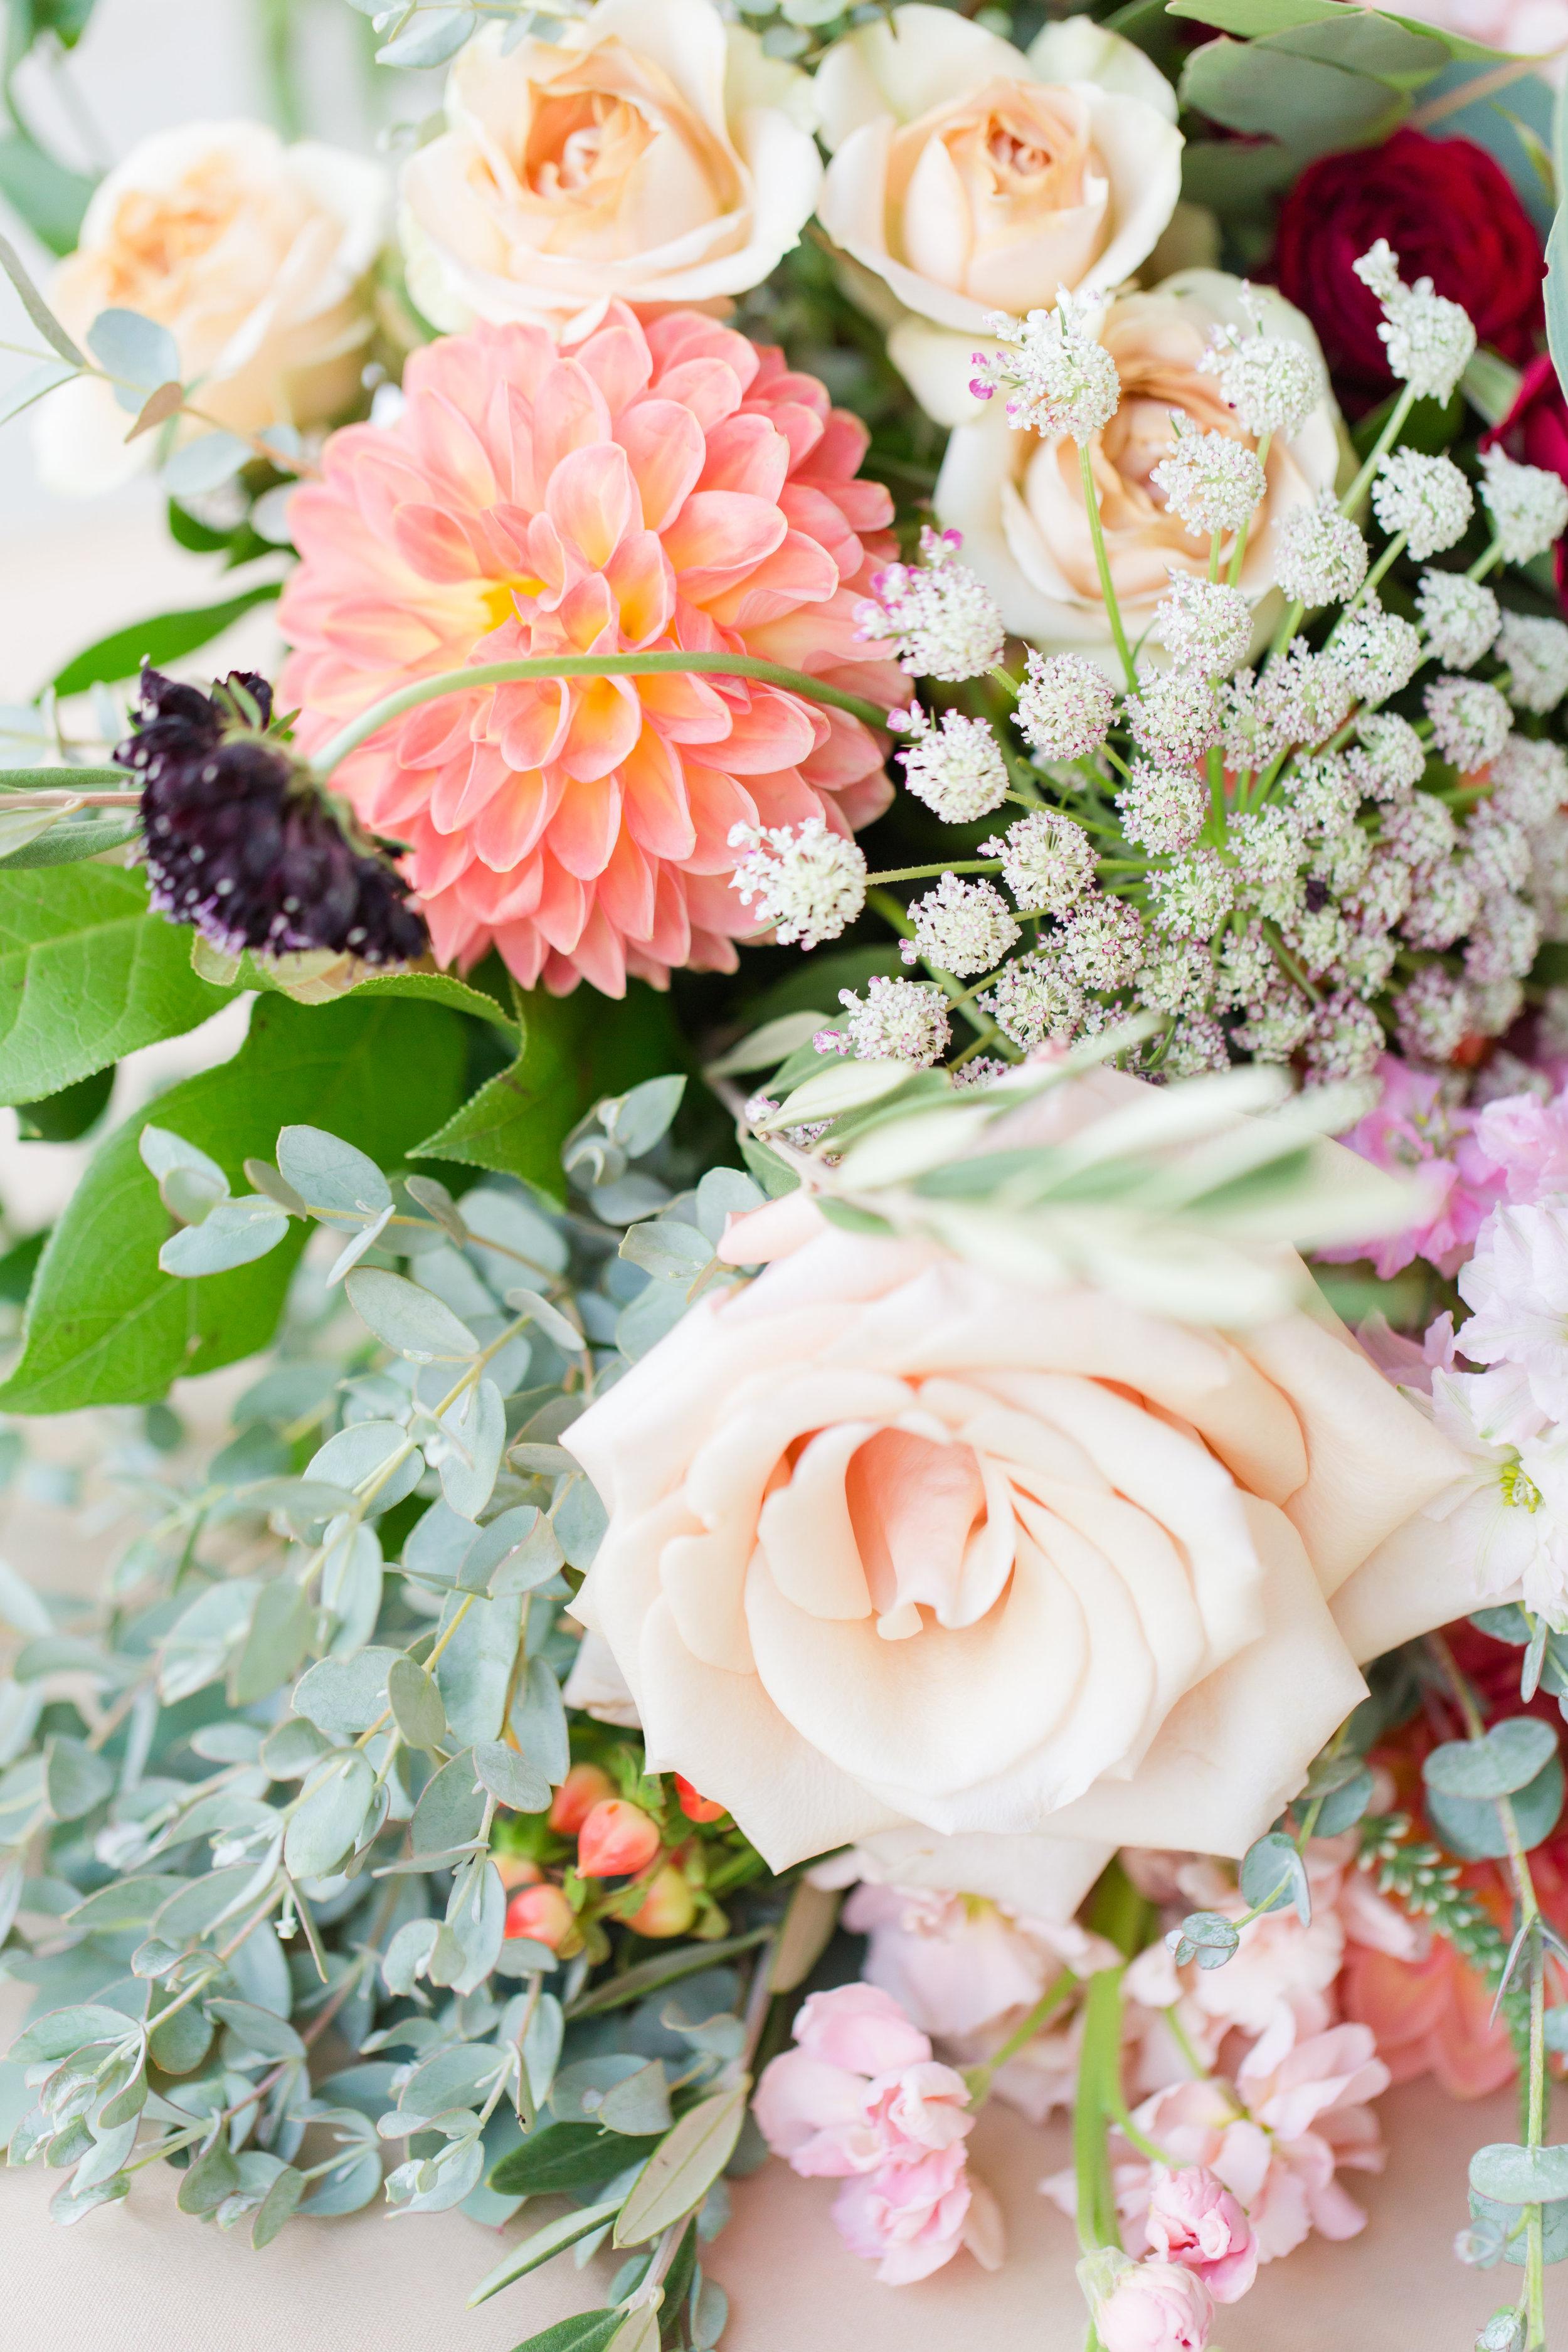 K_S Bridal Details 034.jpg